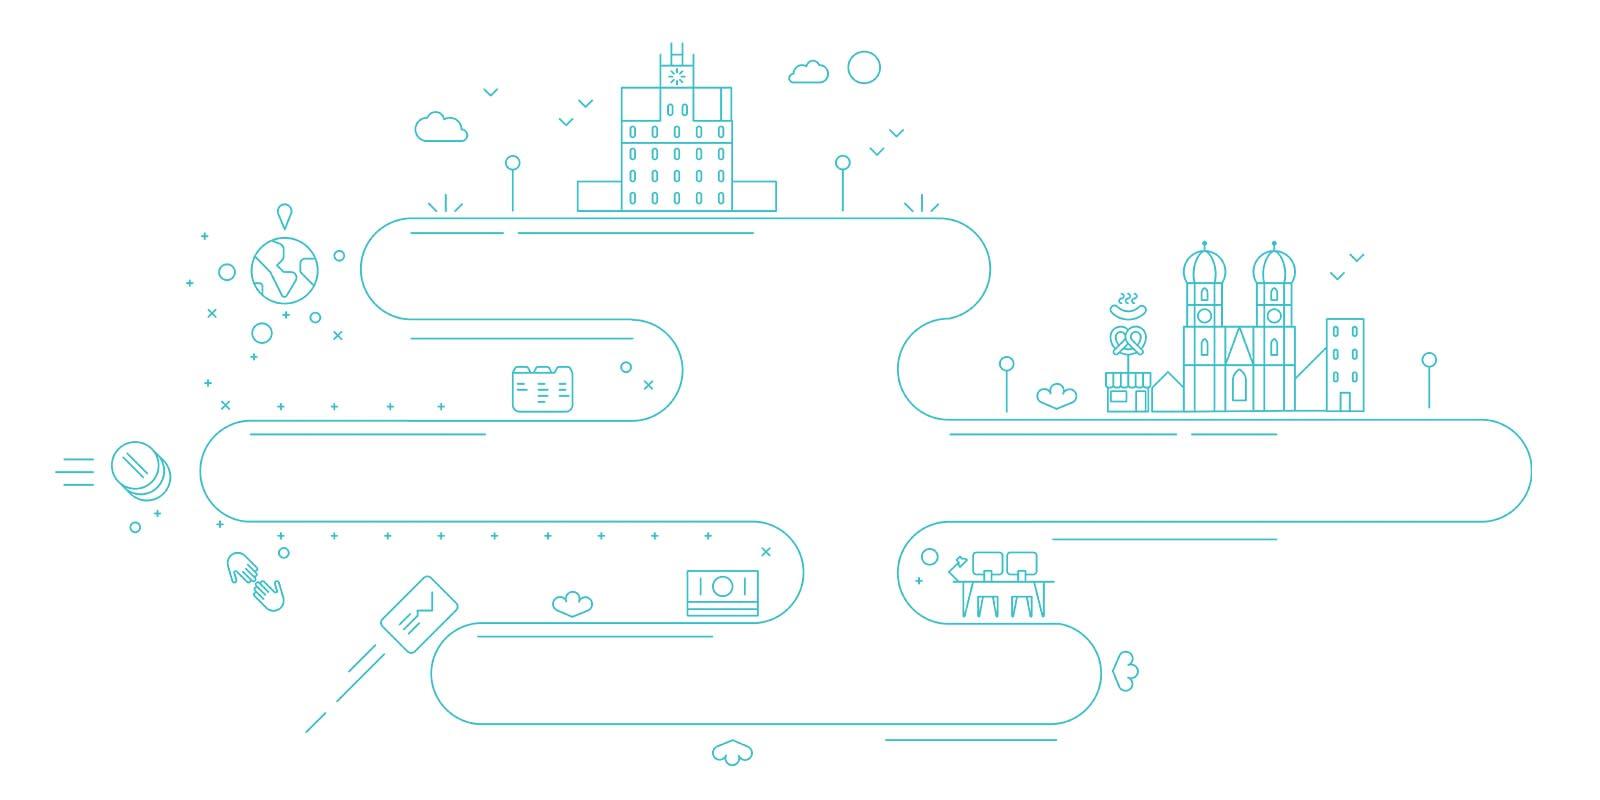 wayra Germany's core business, Investment, community and venture development program